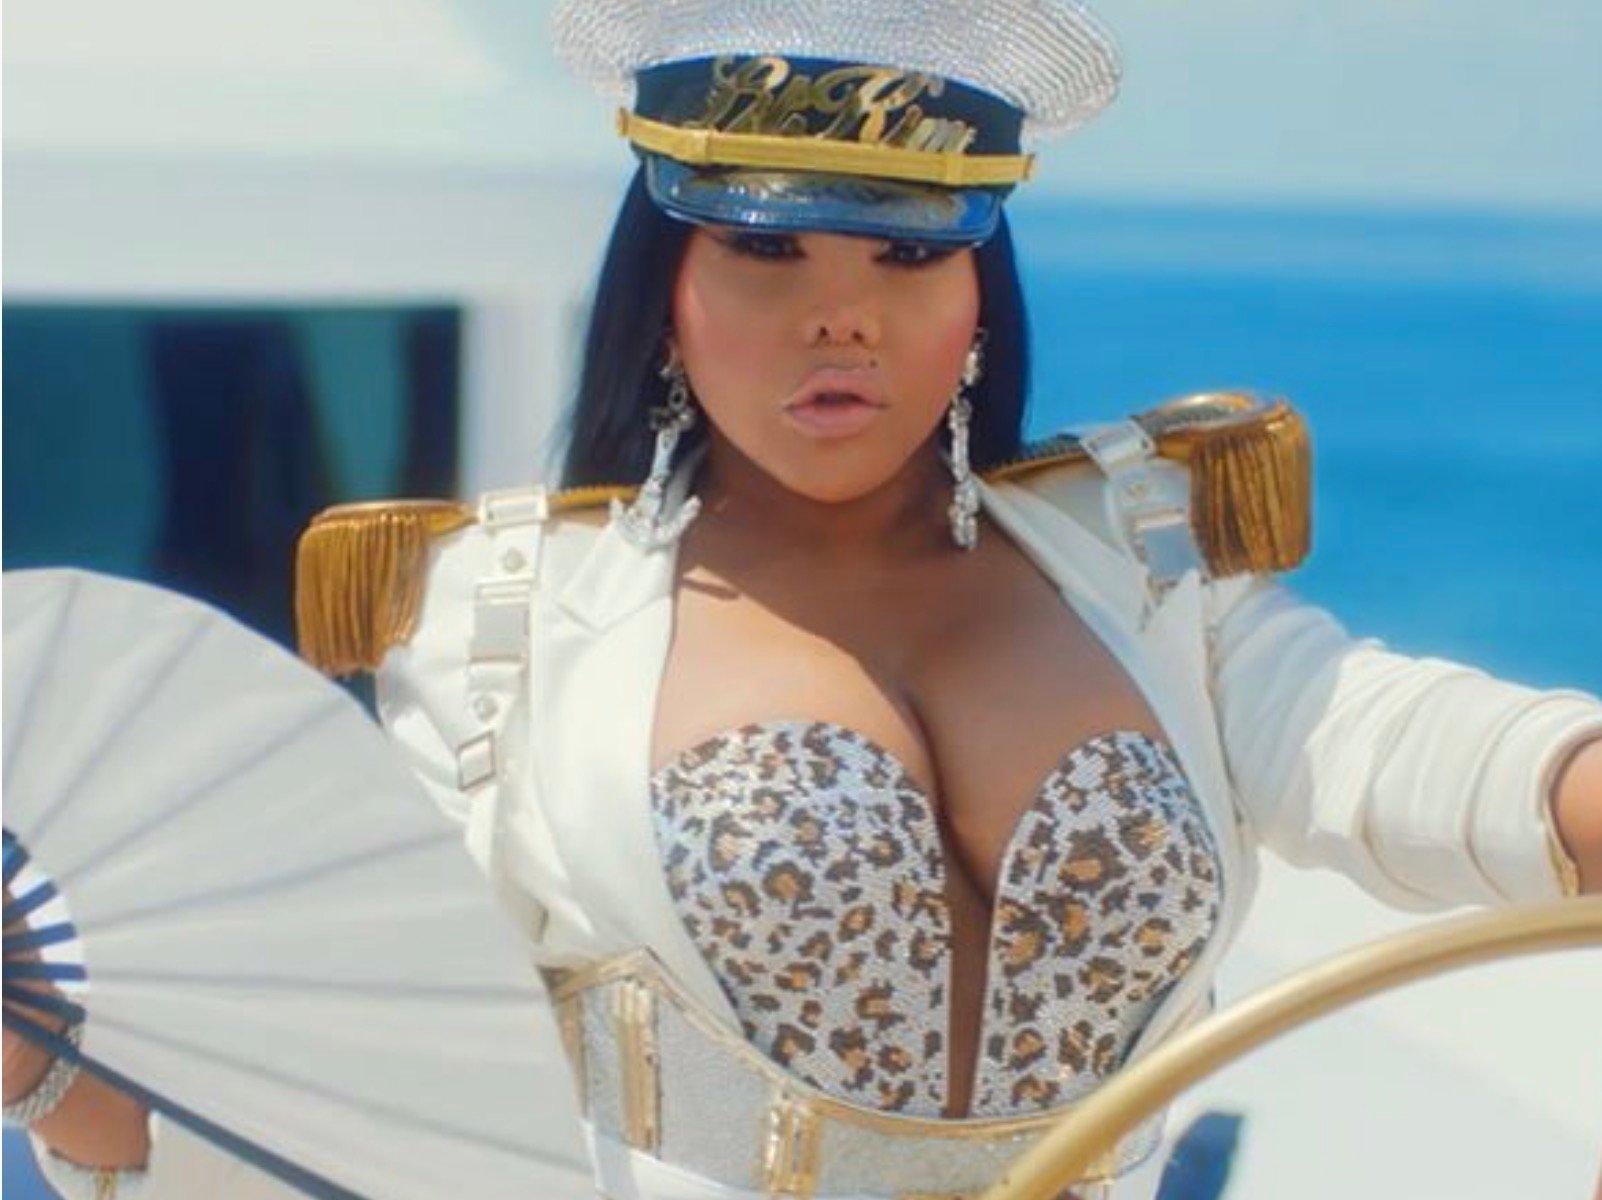 Lil' Kim Girls Cruise Video